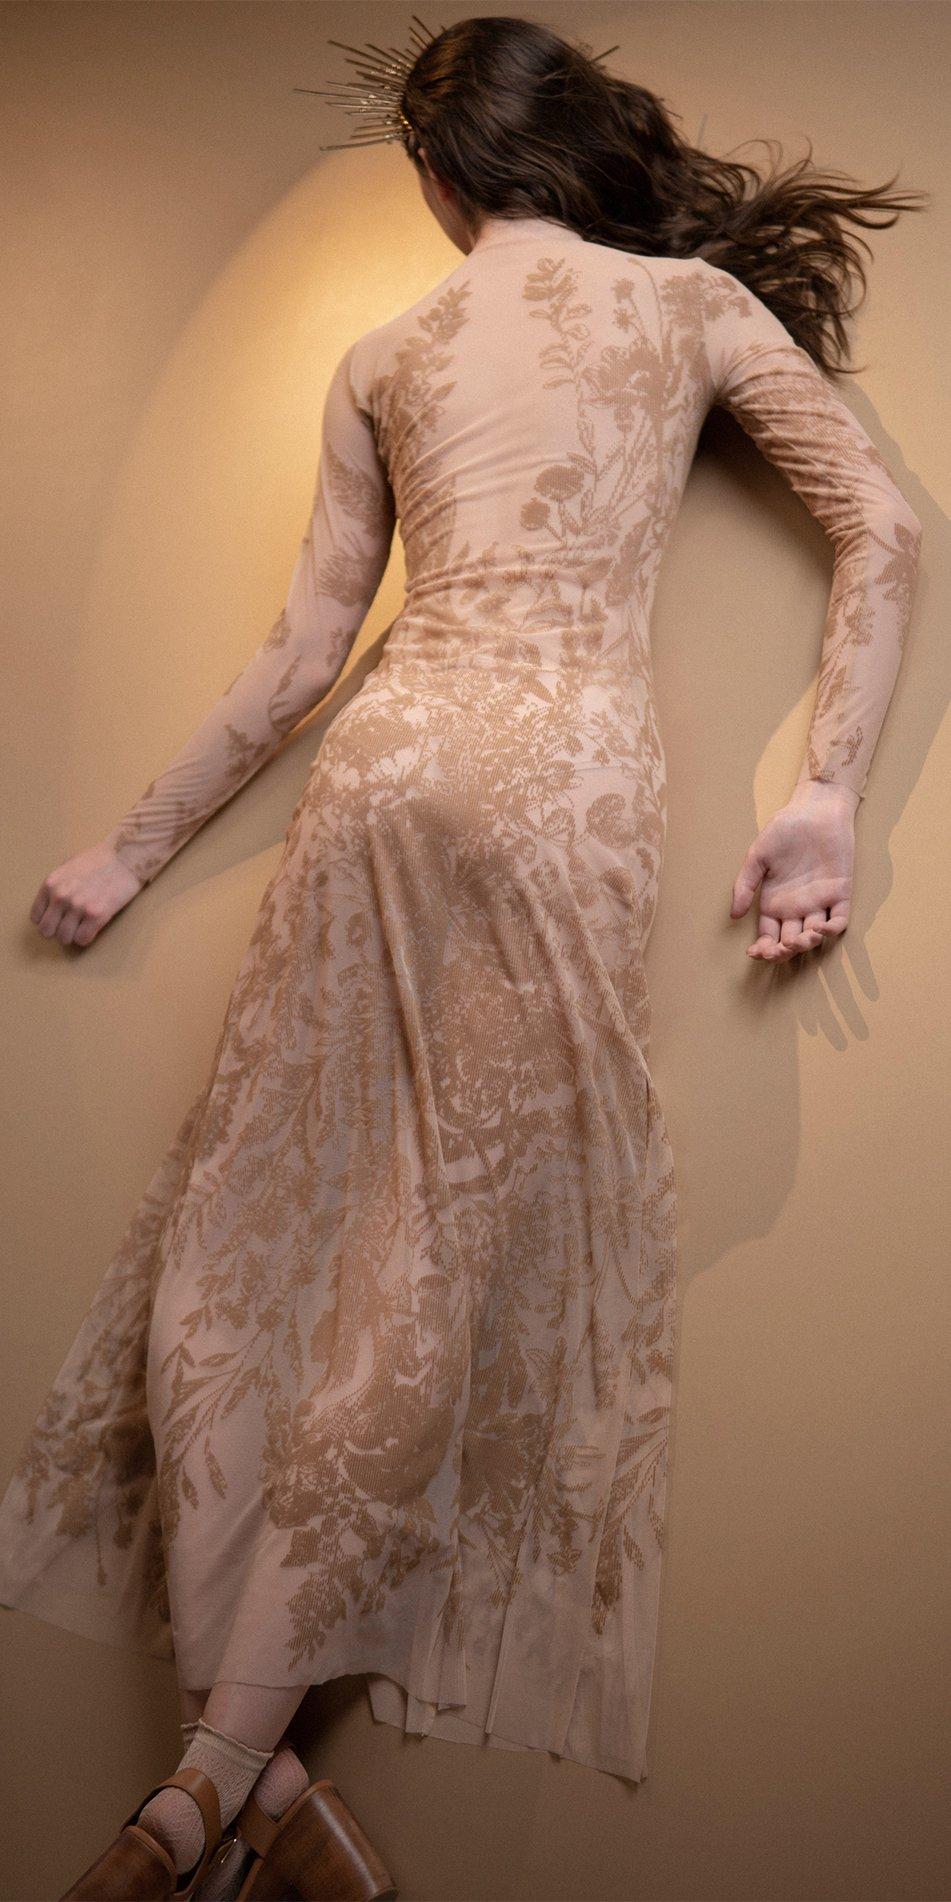 BLOSSOMS nude second skin flock print dress 7